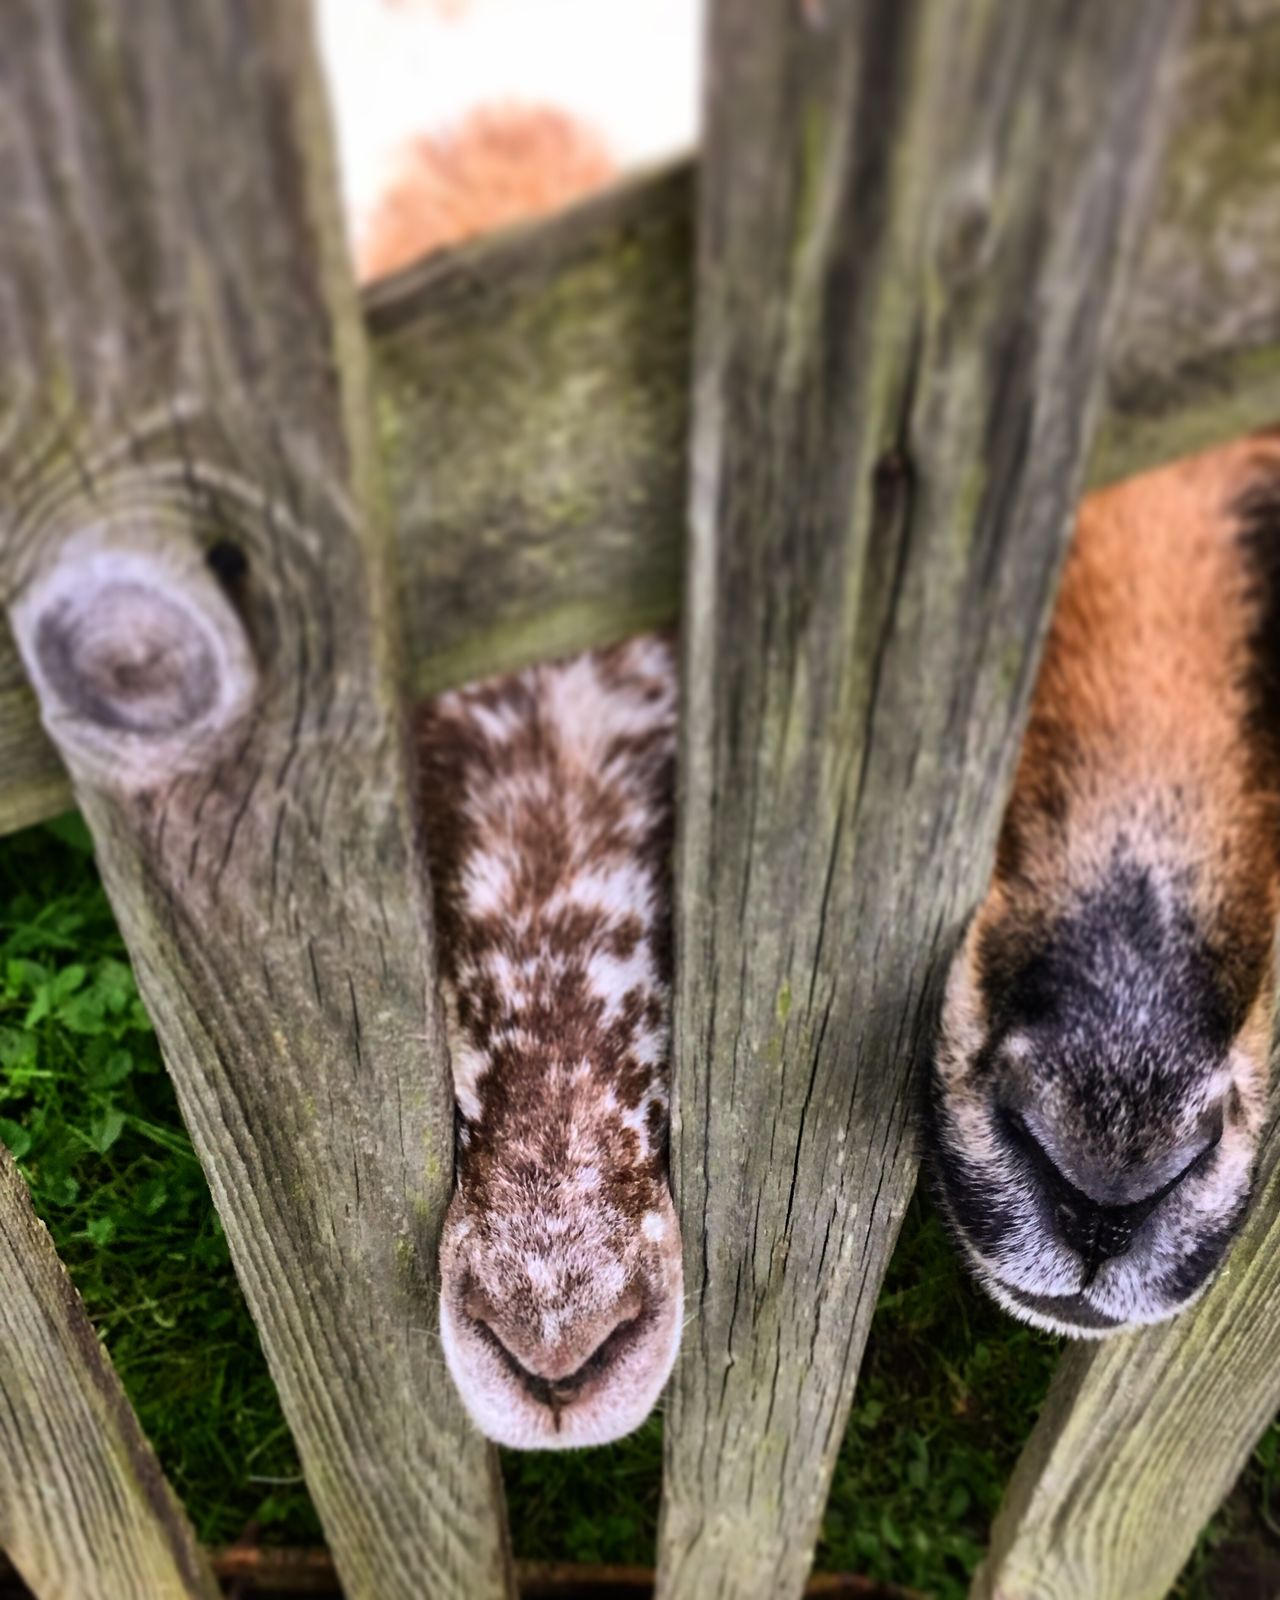 Sheep muzzles Wood - Material Animal Themes No People Day Close-up Outdoors Mammal Wooden Post Nature Animals Muzzle Muzzles Sheep Sheeps Cute Noses Pattern Patterned Peeking Peek Domestic Animals Farm